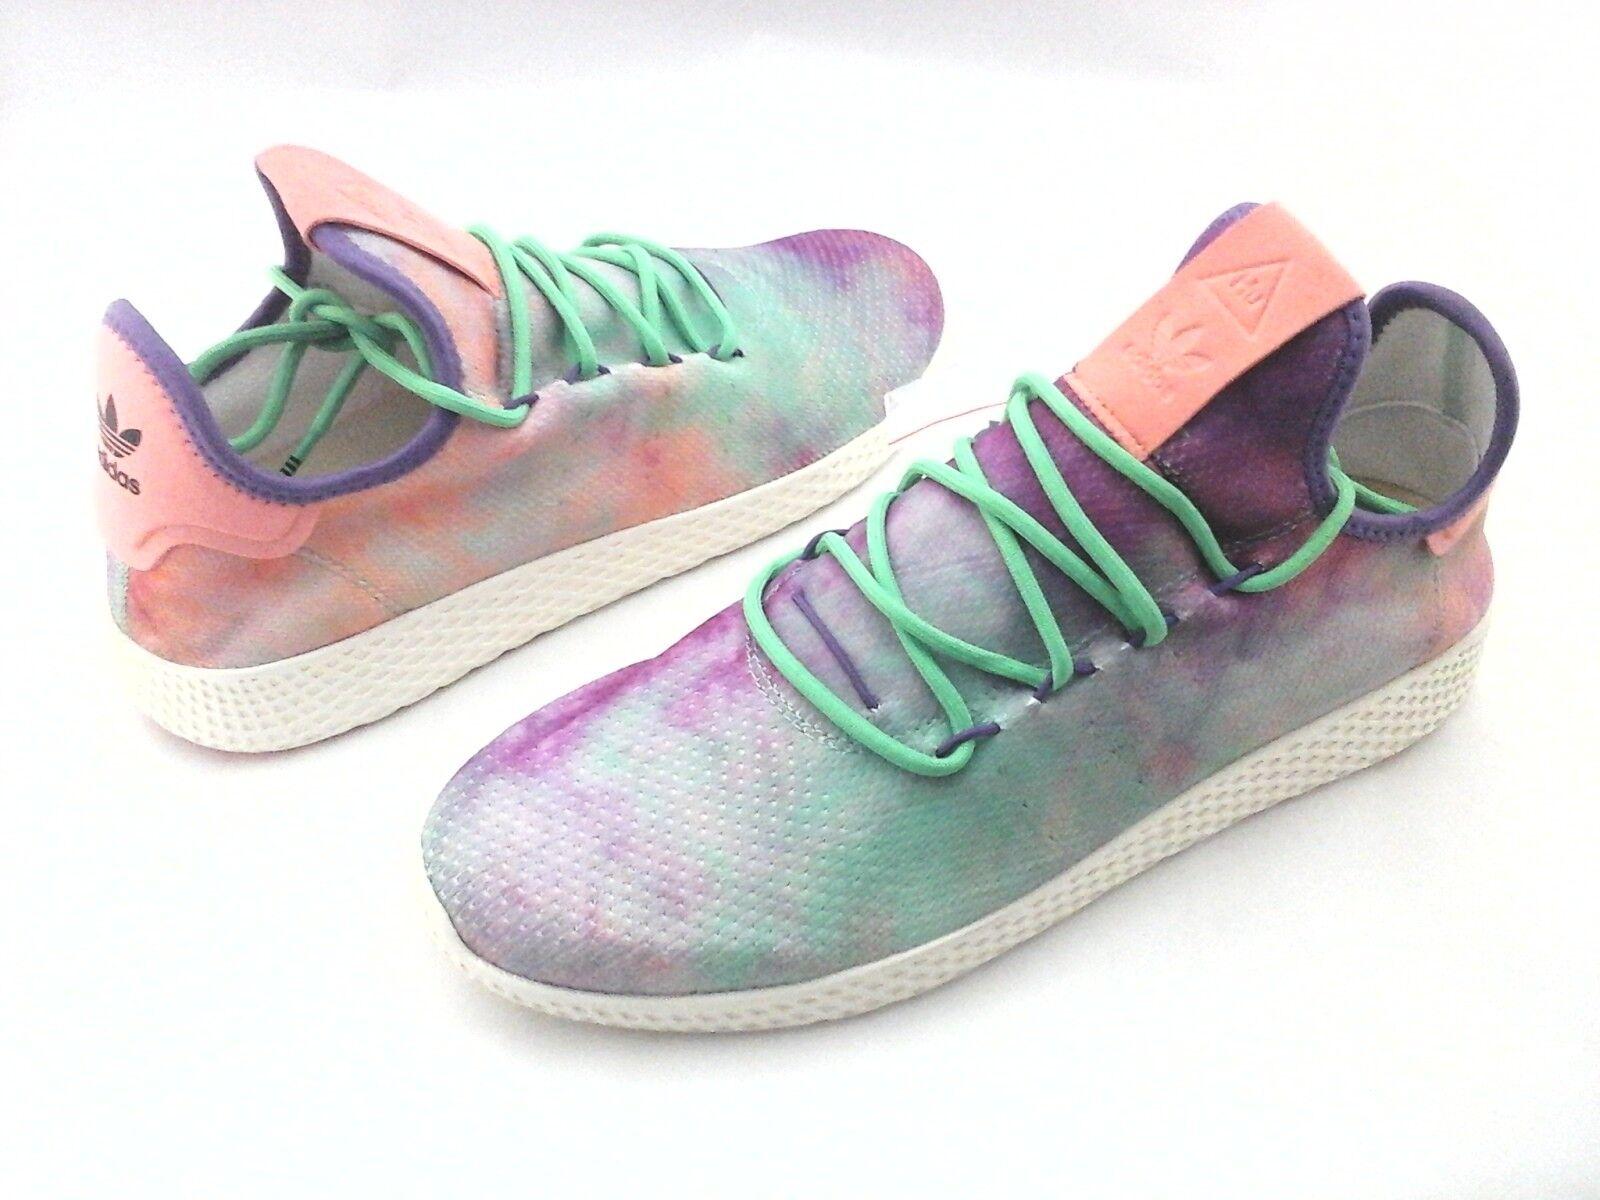 Adidas pharrell williams hu lila tennis holi krawatte farbstoff schuhe ac7366 uns 12 / 46 2 / 3